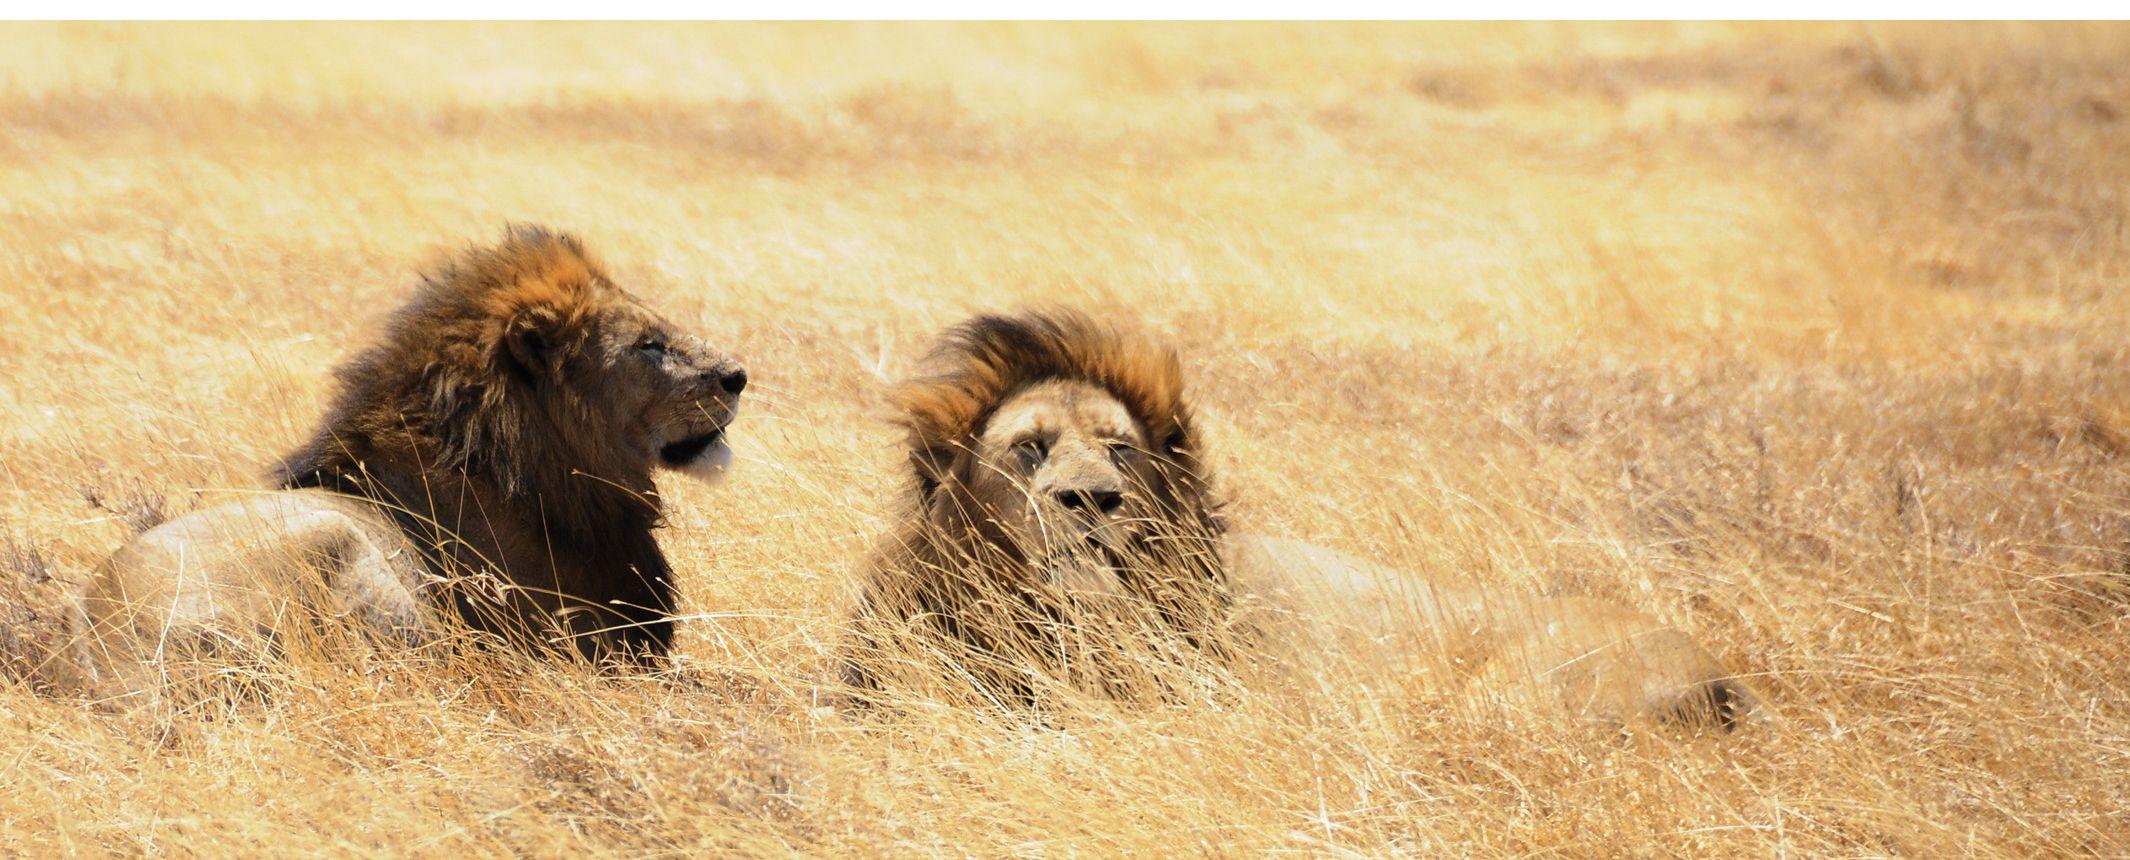 Kenya y Tanzania - Safari Kamili